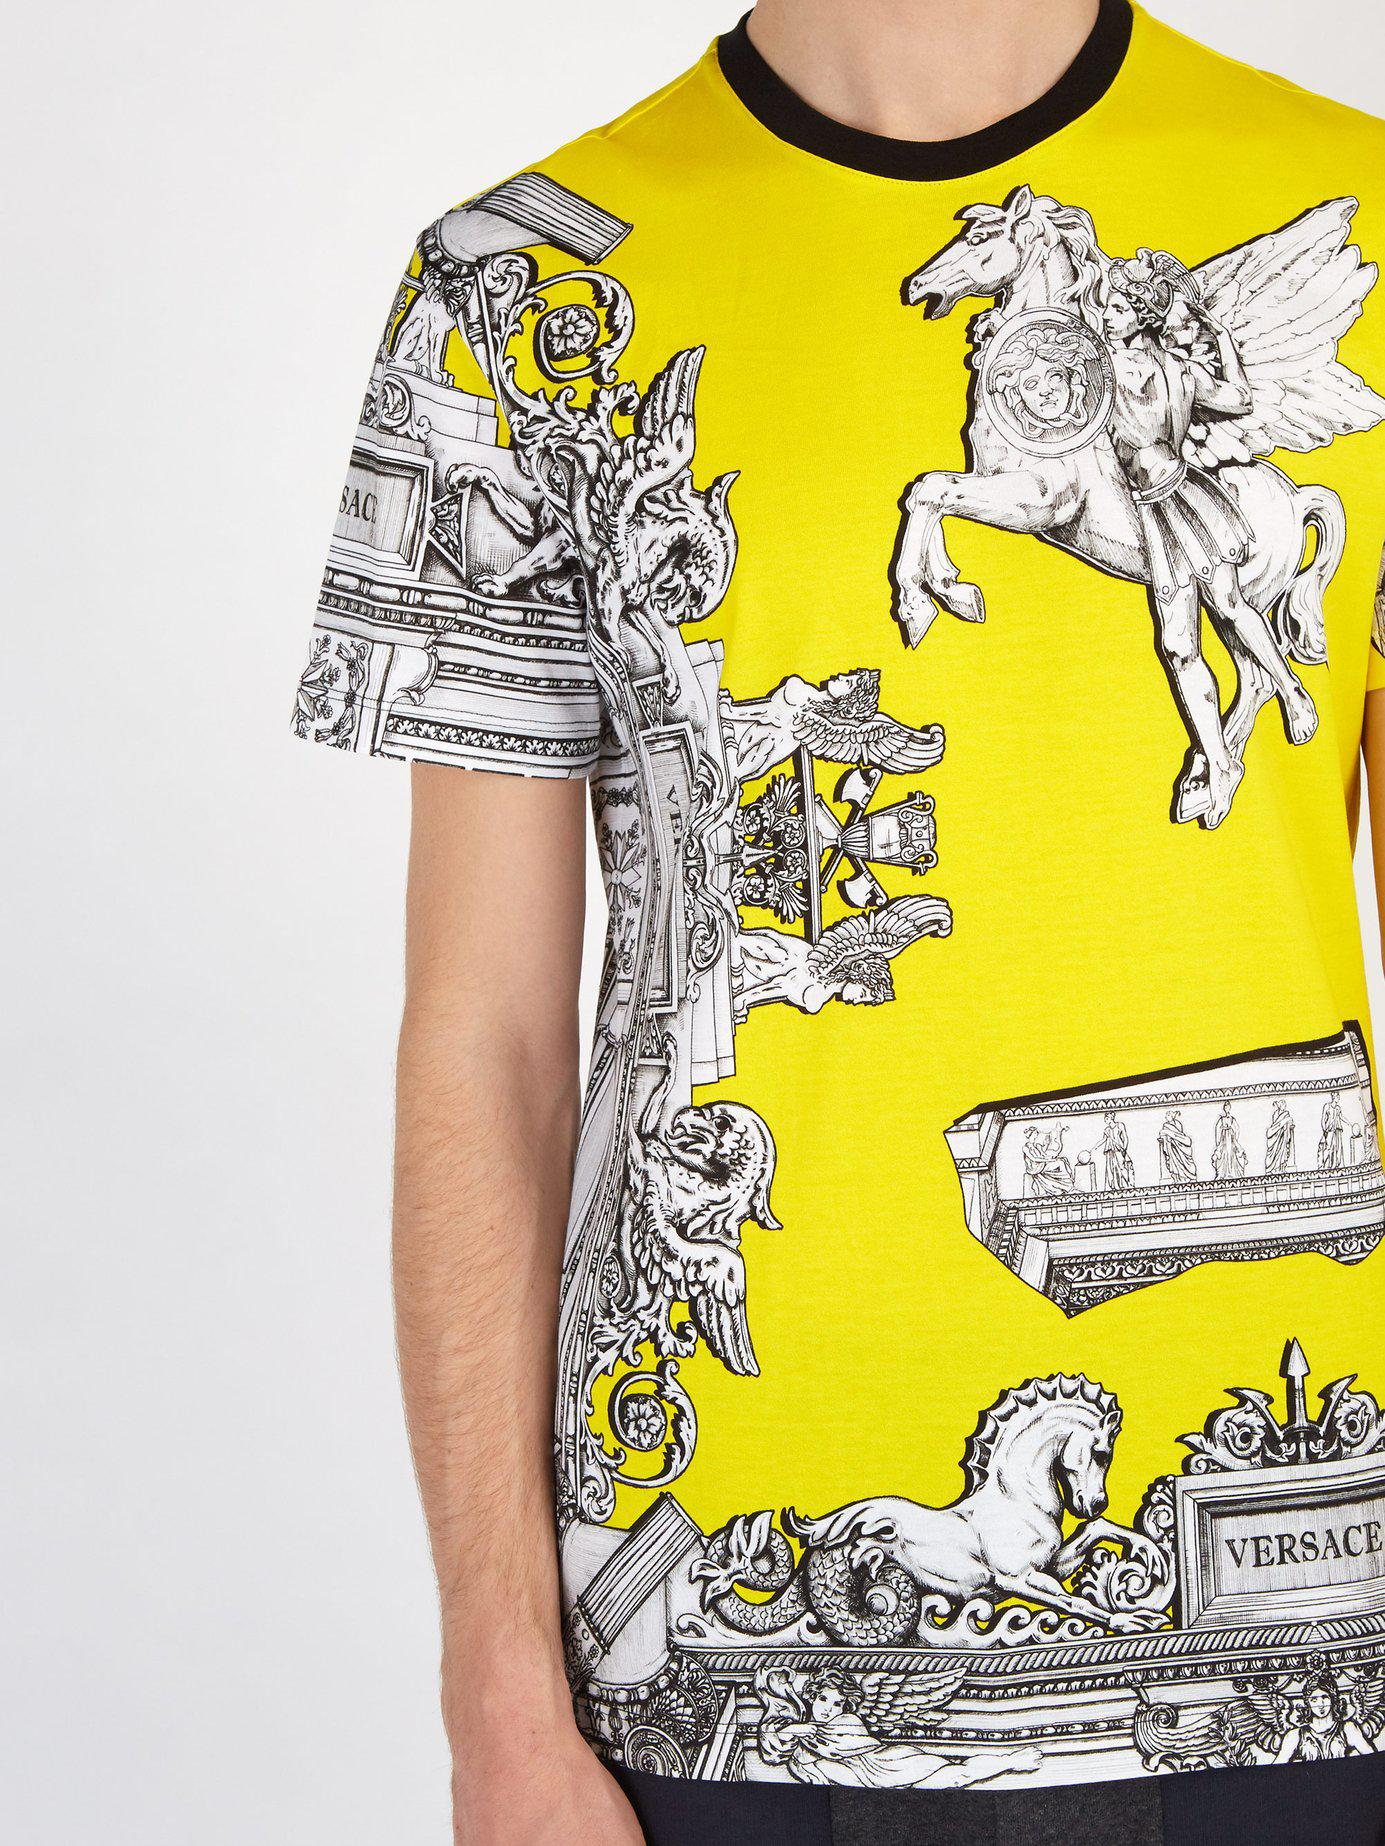 b58ac1b5 Versace - Yellow Baroque Print Pegasus T Shirt for Men - Lyst. View  fullscreen